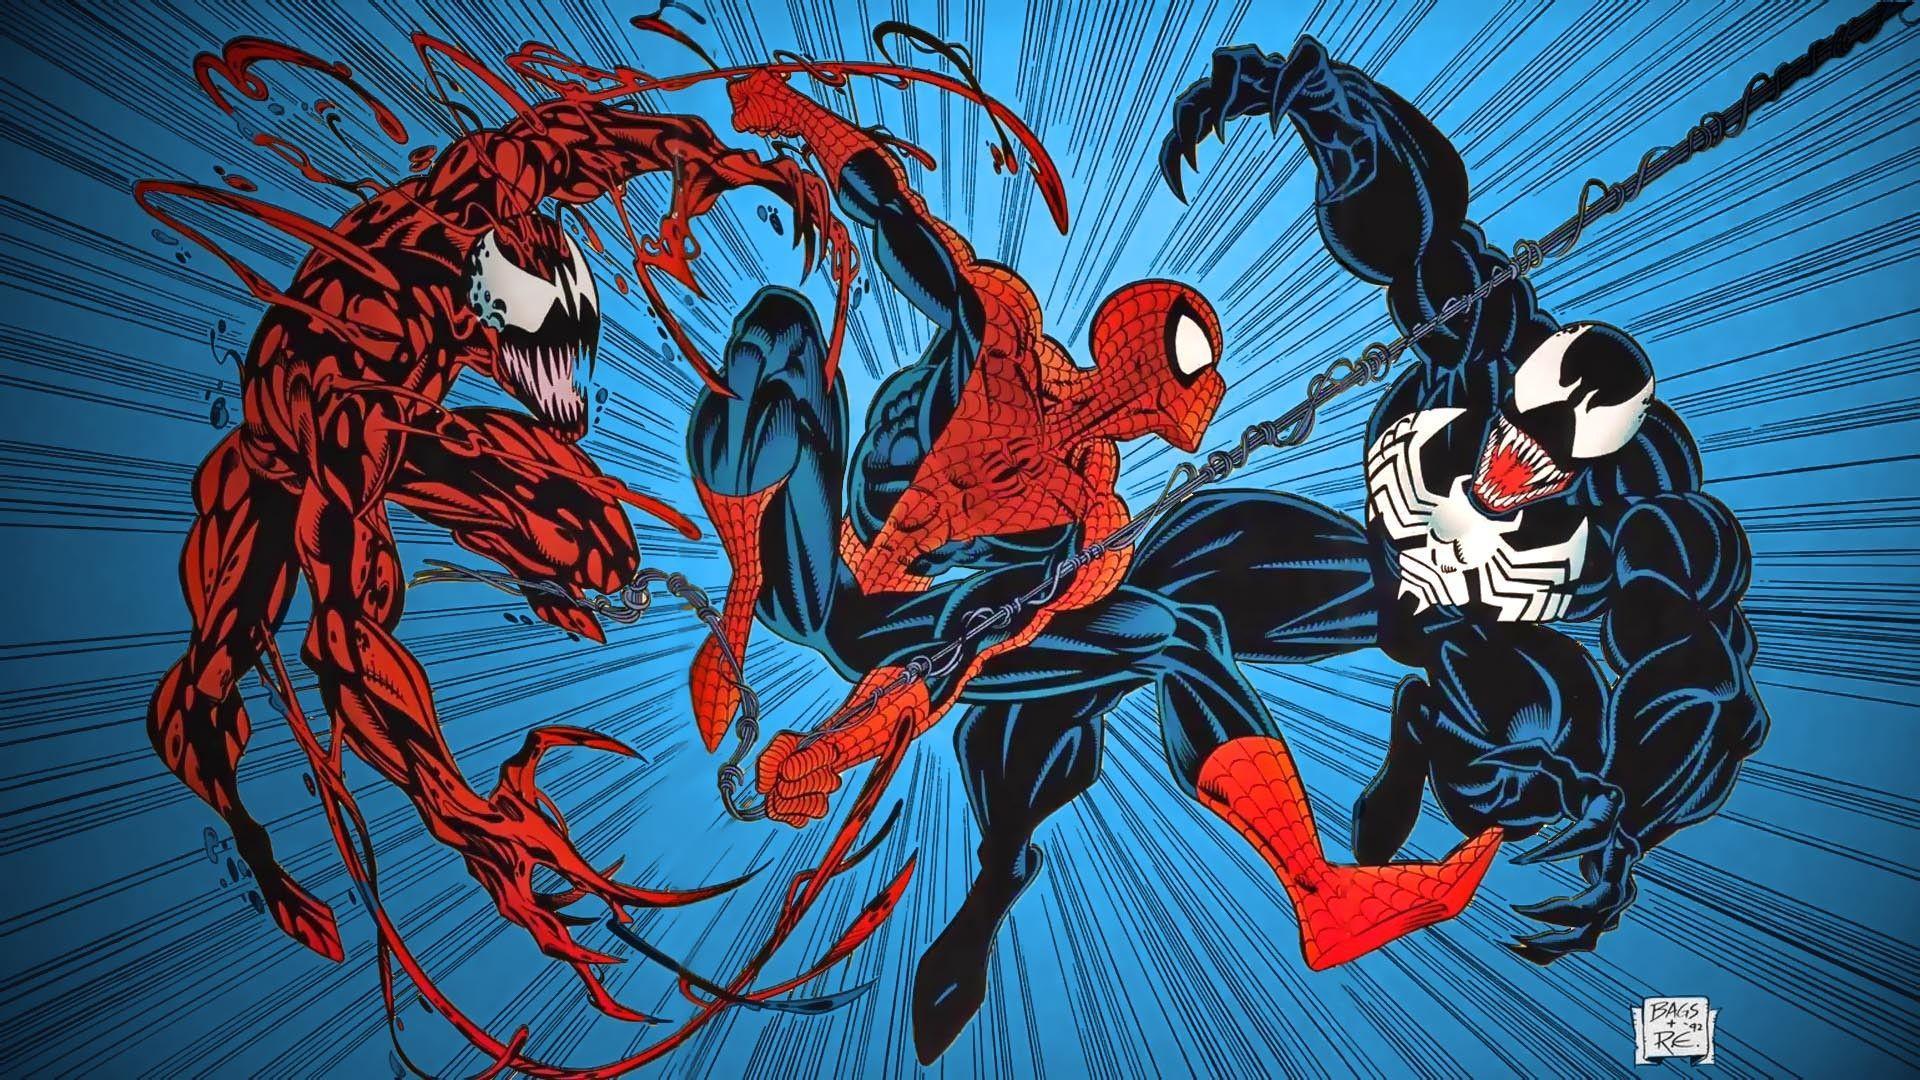 Venom And Carnage Hd Wallpaper - Vote Wallpaper